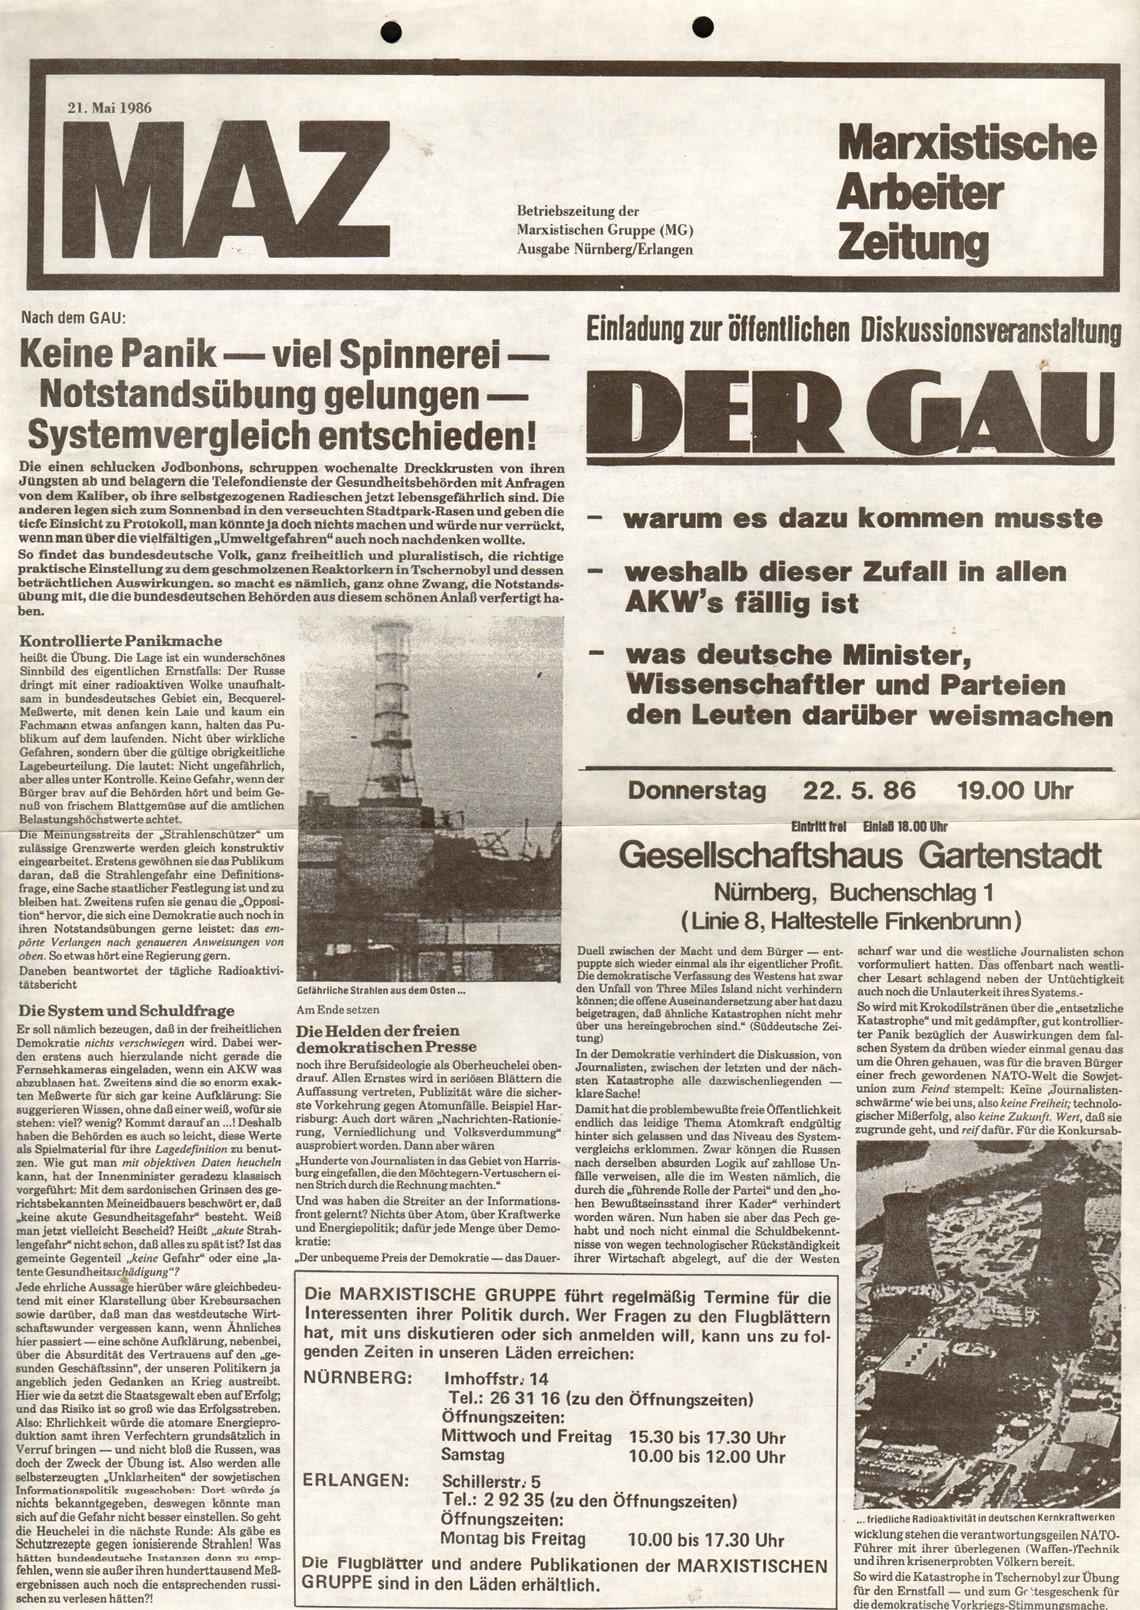 Nuernberg_Erlangen_MG_MAZ_19840521_01